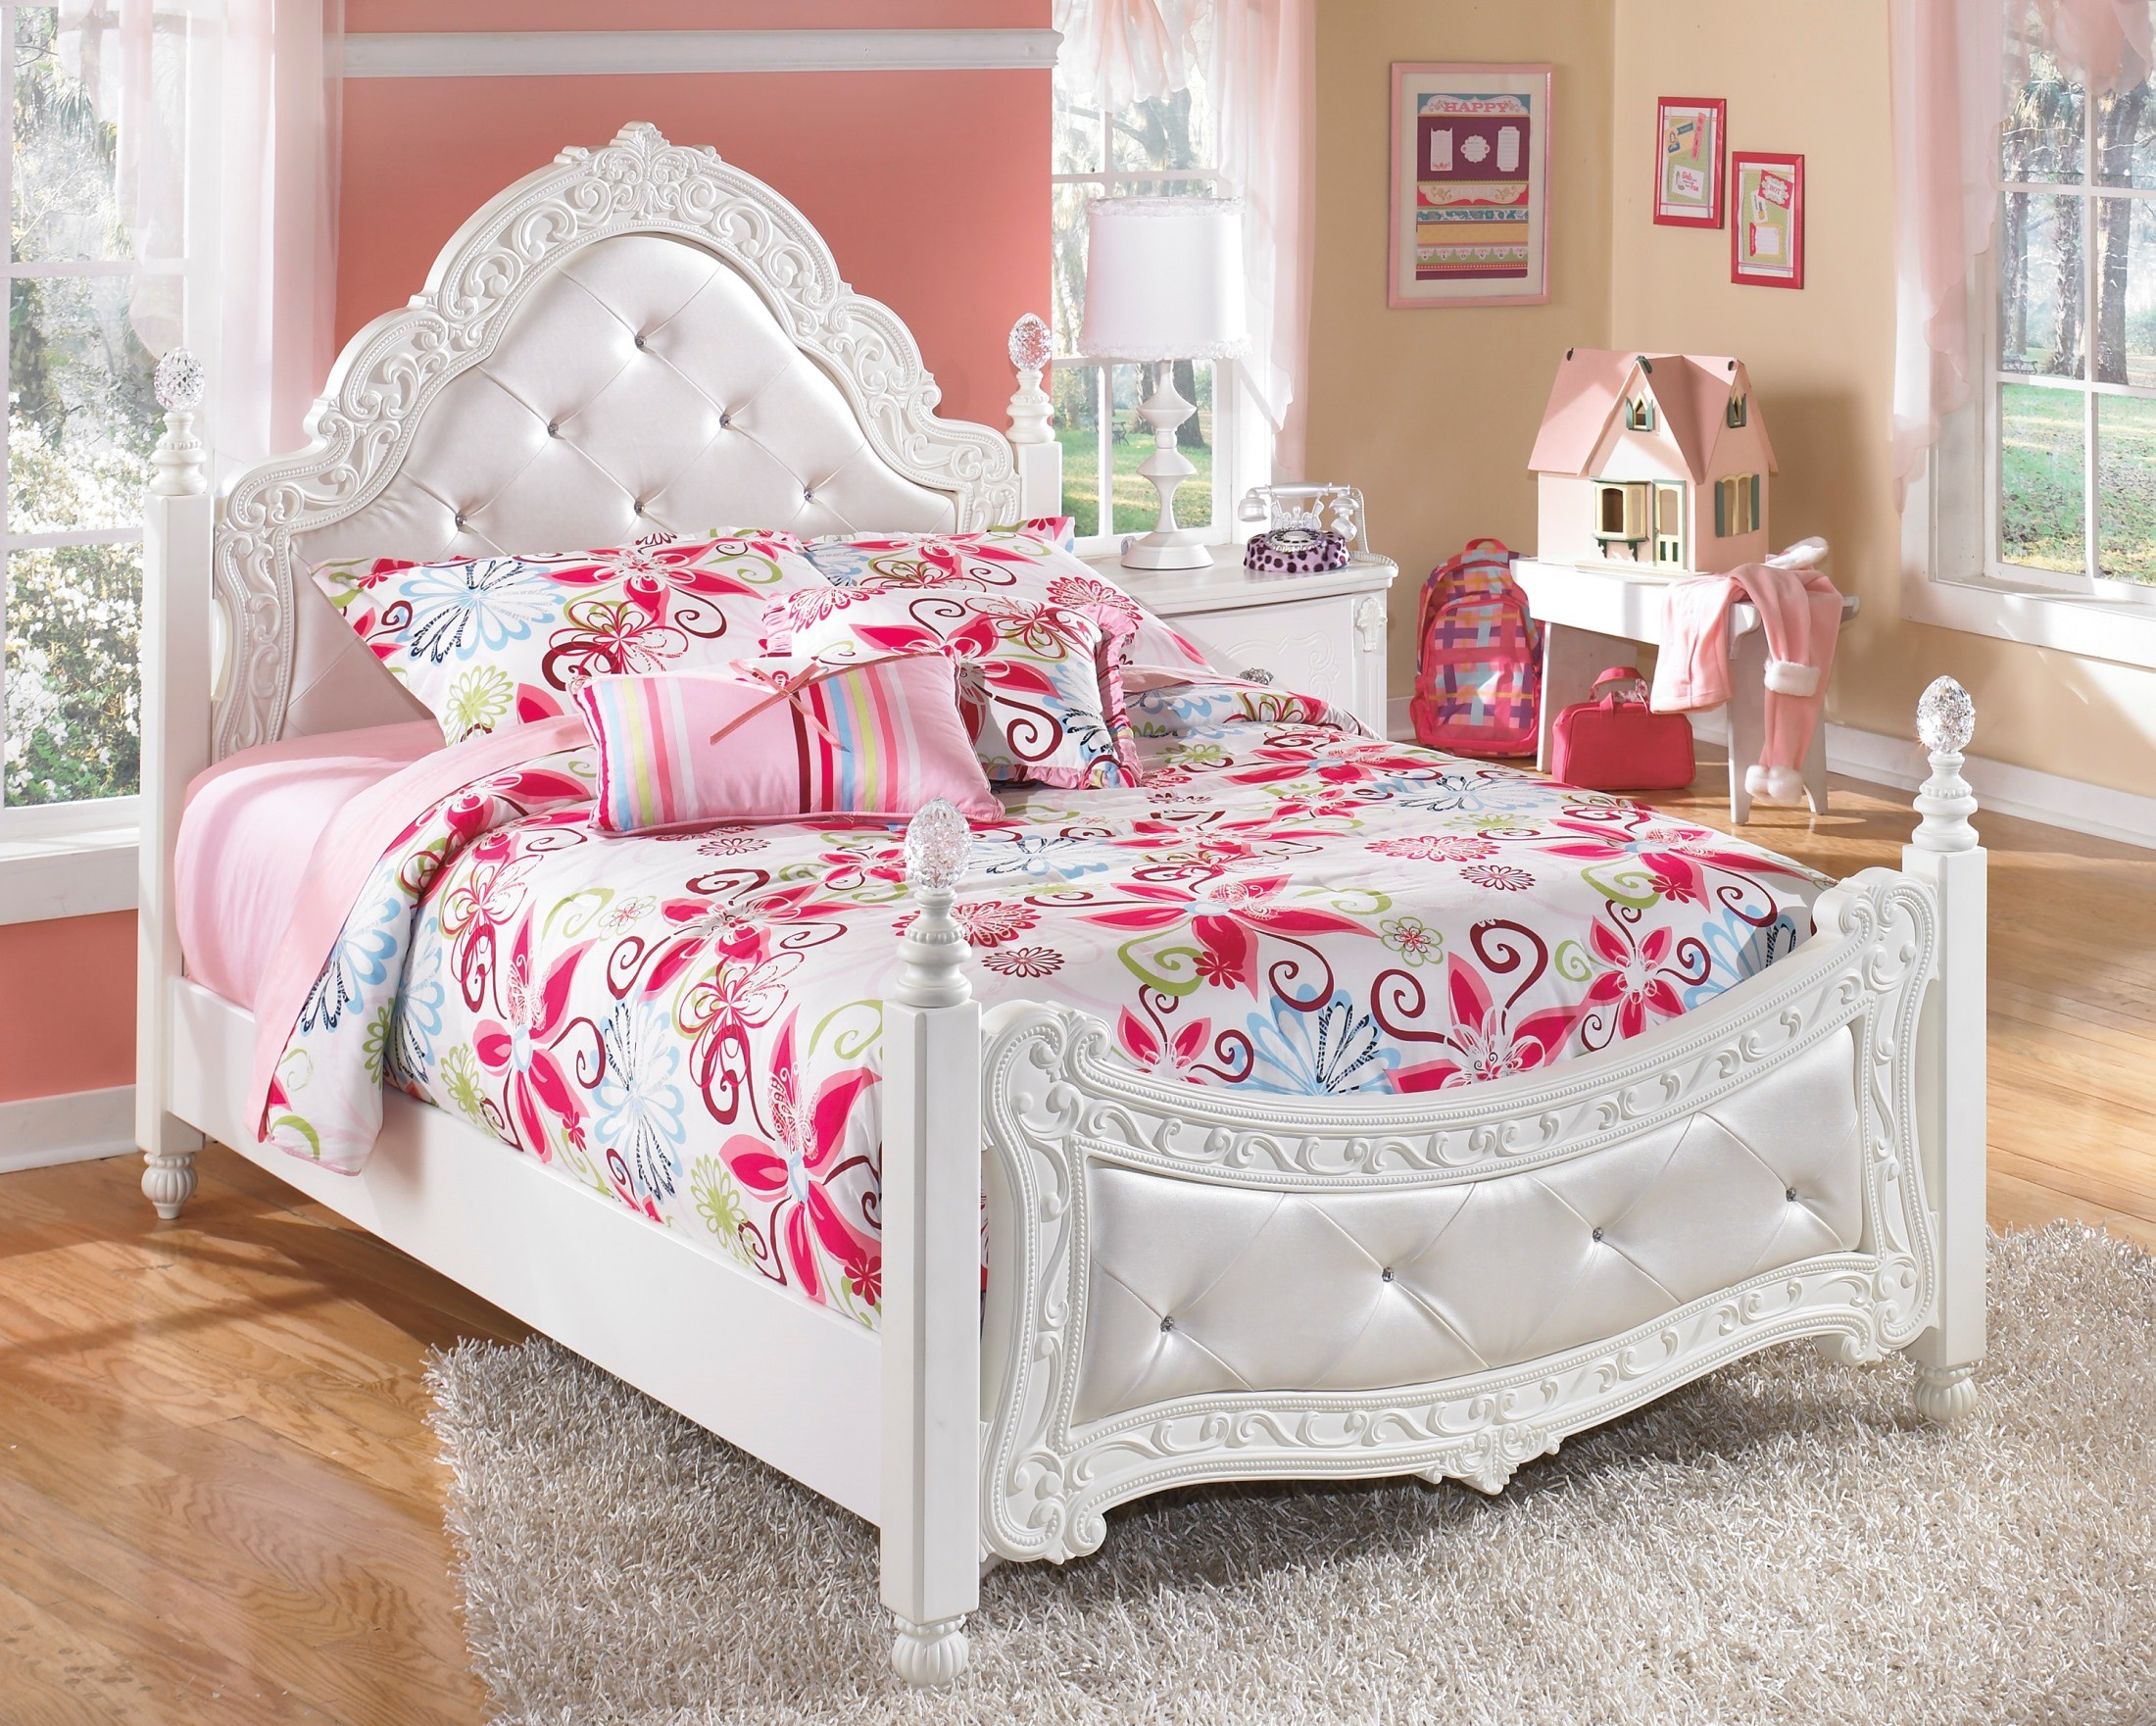 Exquisite Poster Bedroom Set From Ashley Asl B188 71 82n Coleman Furniture